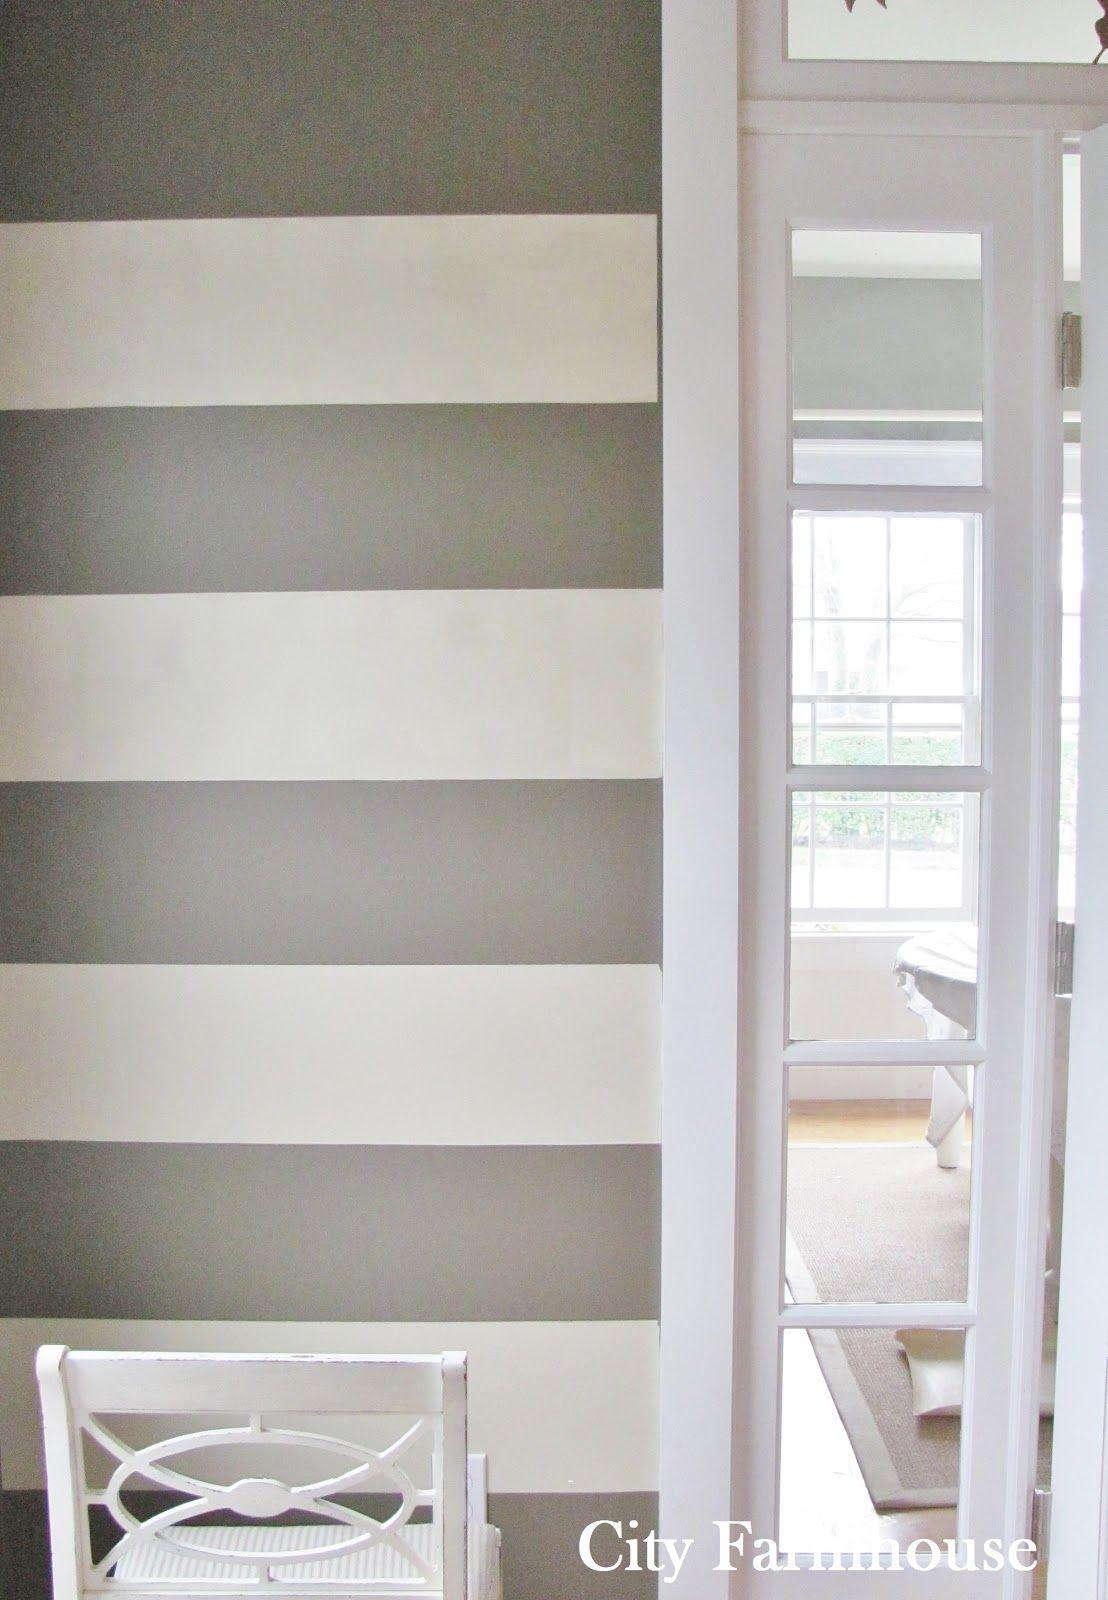 Contact Paper Wall Stripes City Farmhouse Contact Paper Wall Striped Walls Apartment Deco